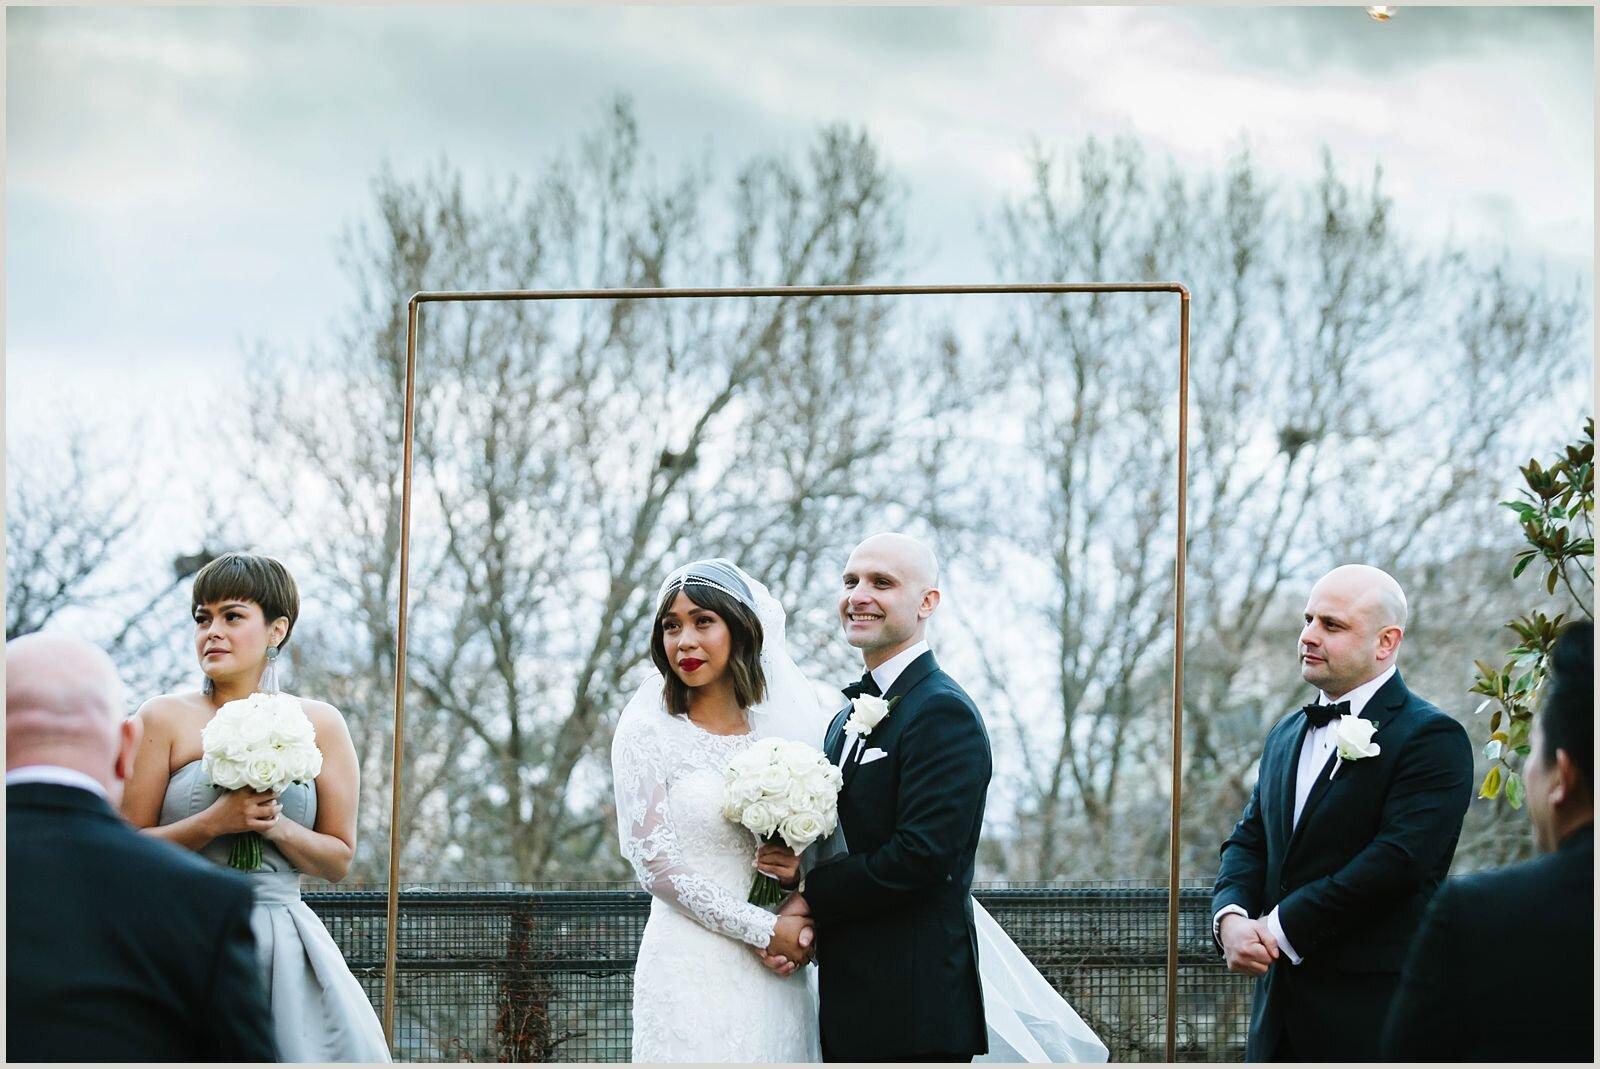 joseph_koprek_wedding_melbourne_the_prince_deck_0054.jpg